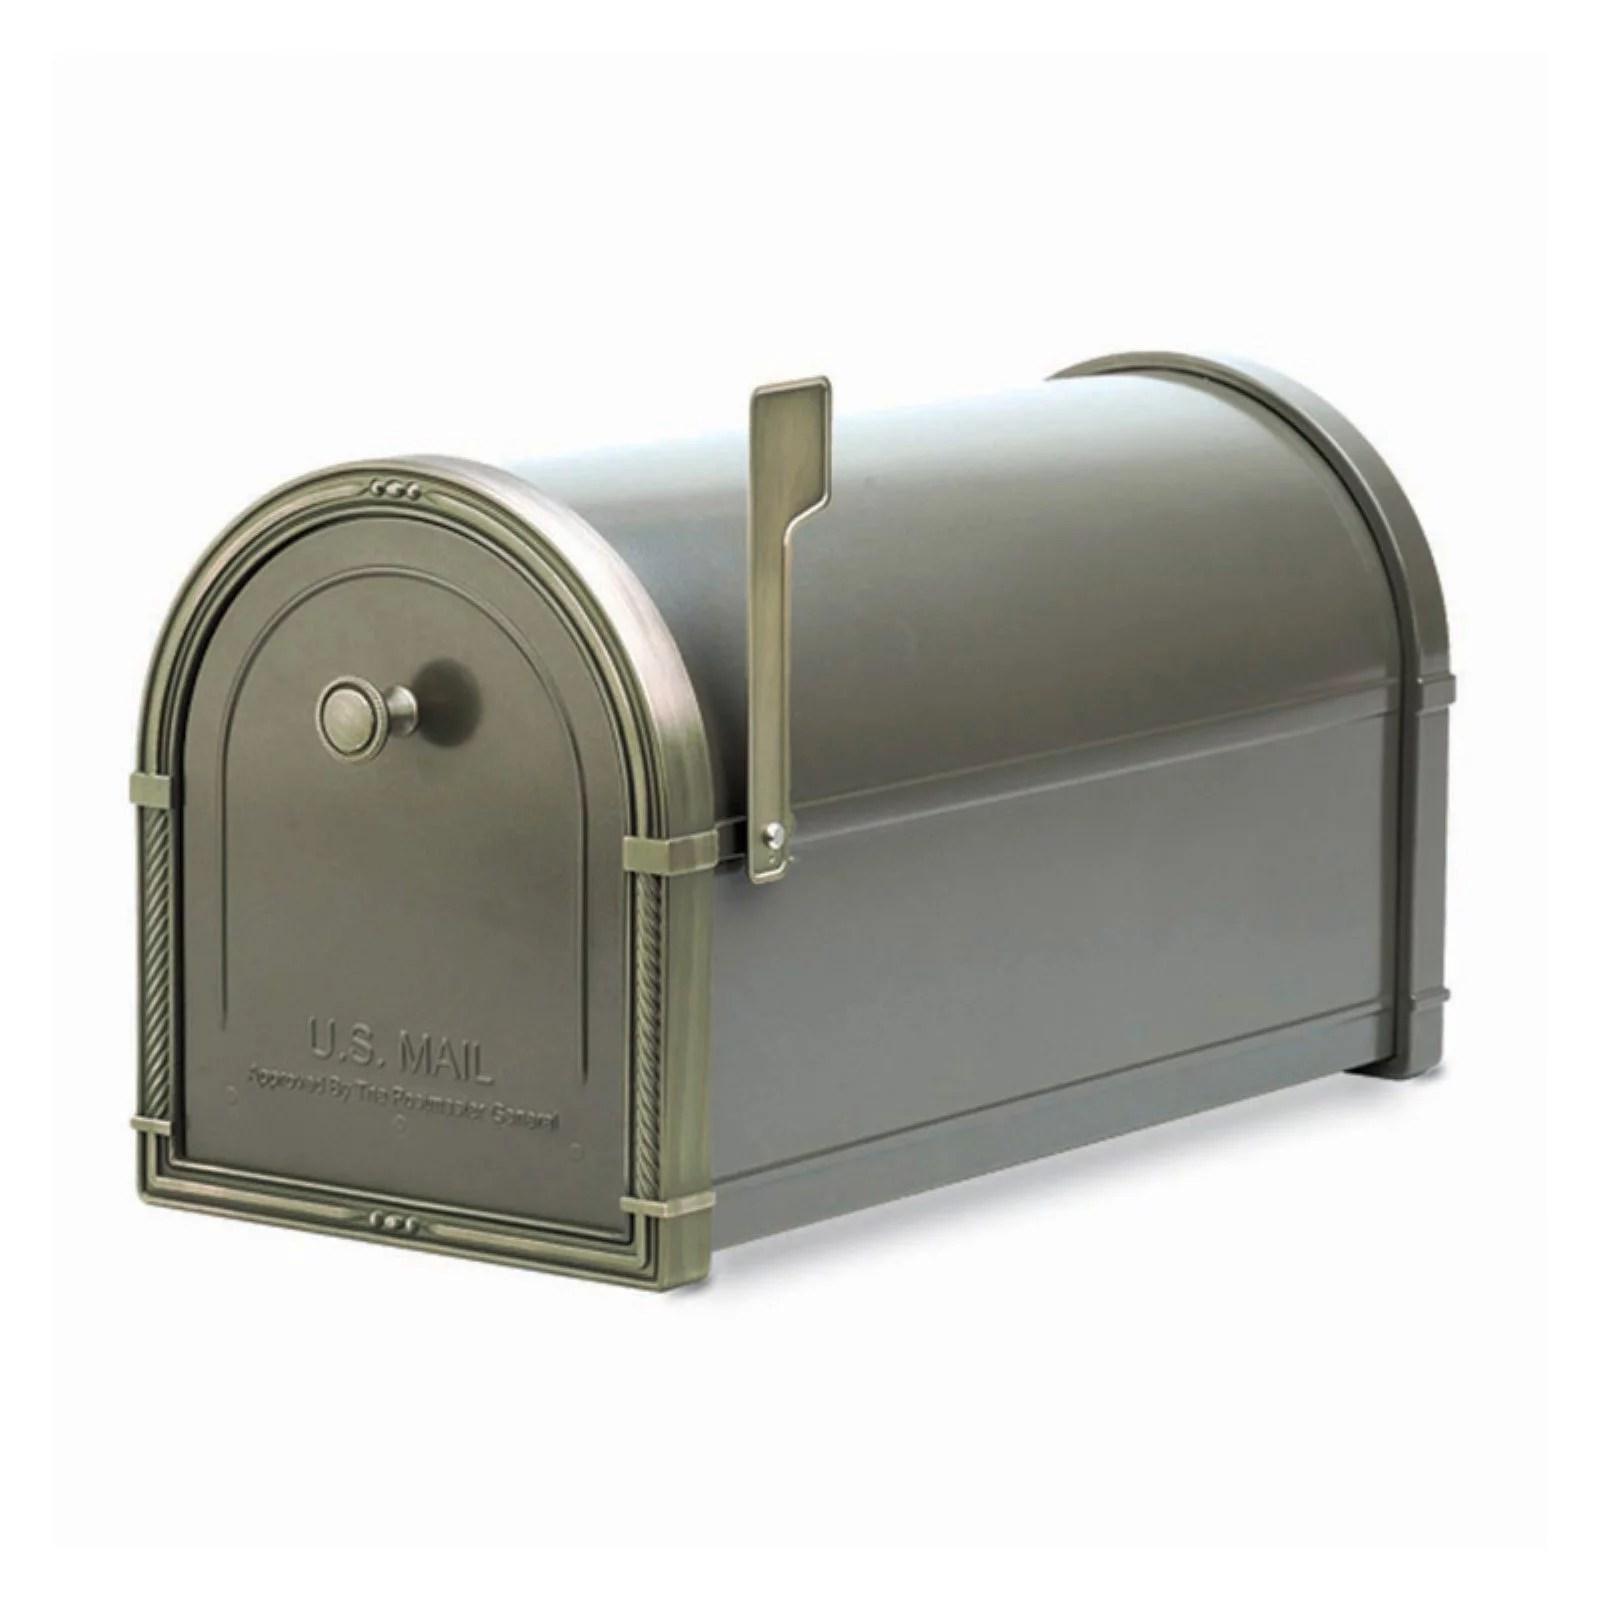 Architectural Mailboxes Coronado Mailbox Black With Antique Bronze Accents Walmart Com Walmart Com